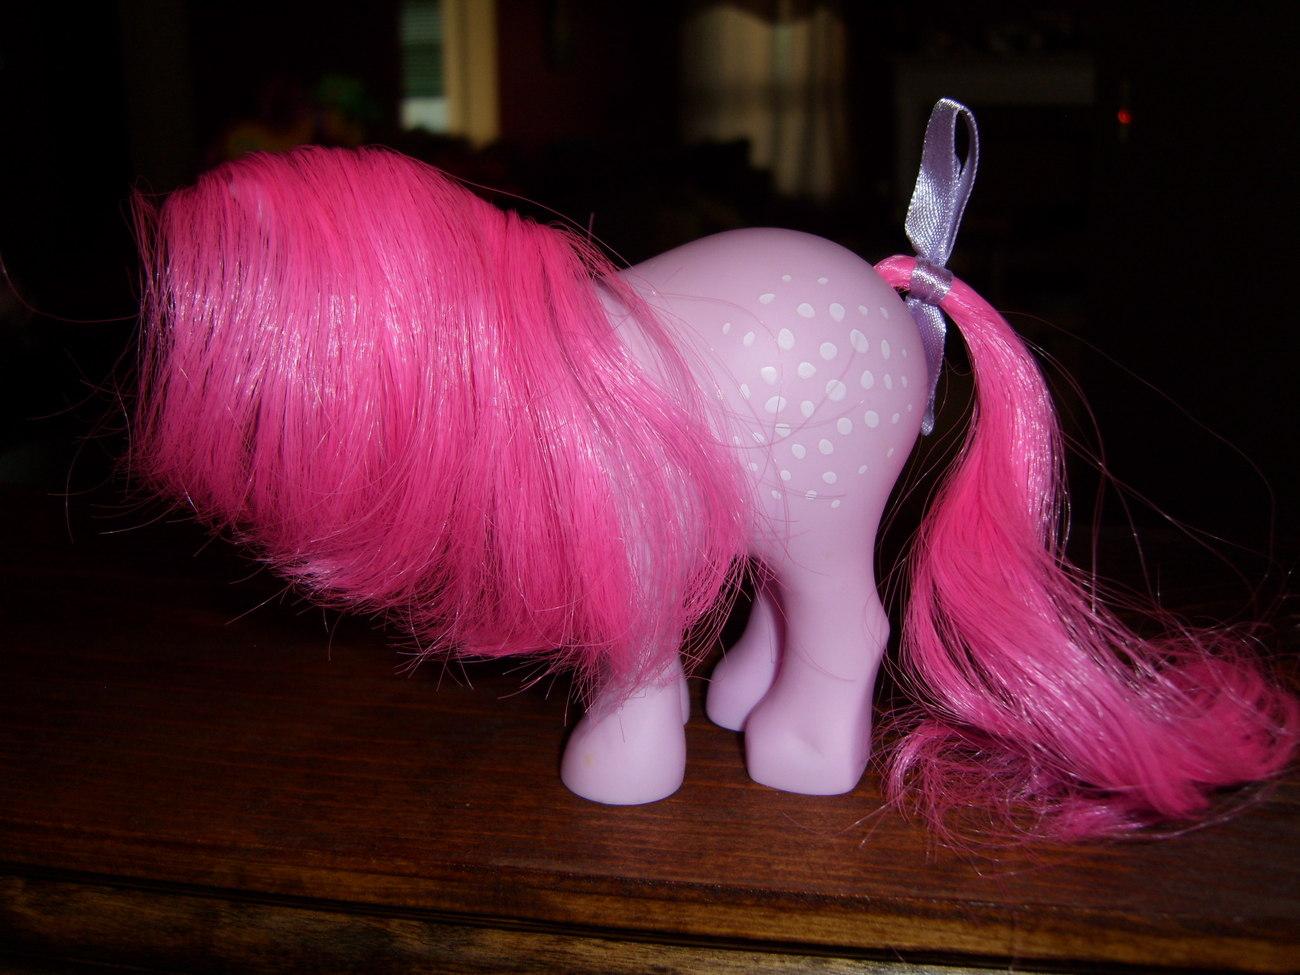 My Little Pony G1 Retro 2007 FF Cotton Candy